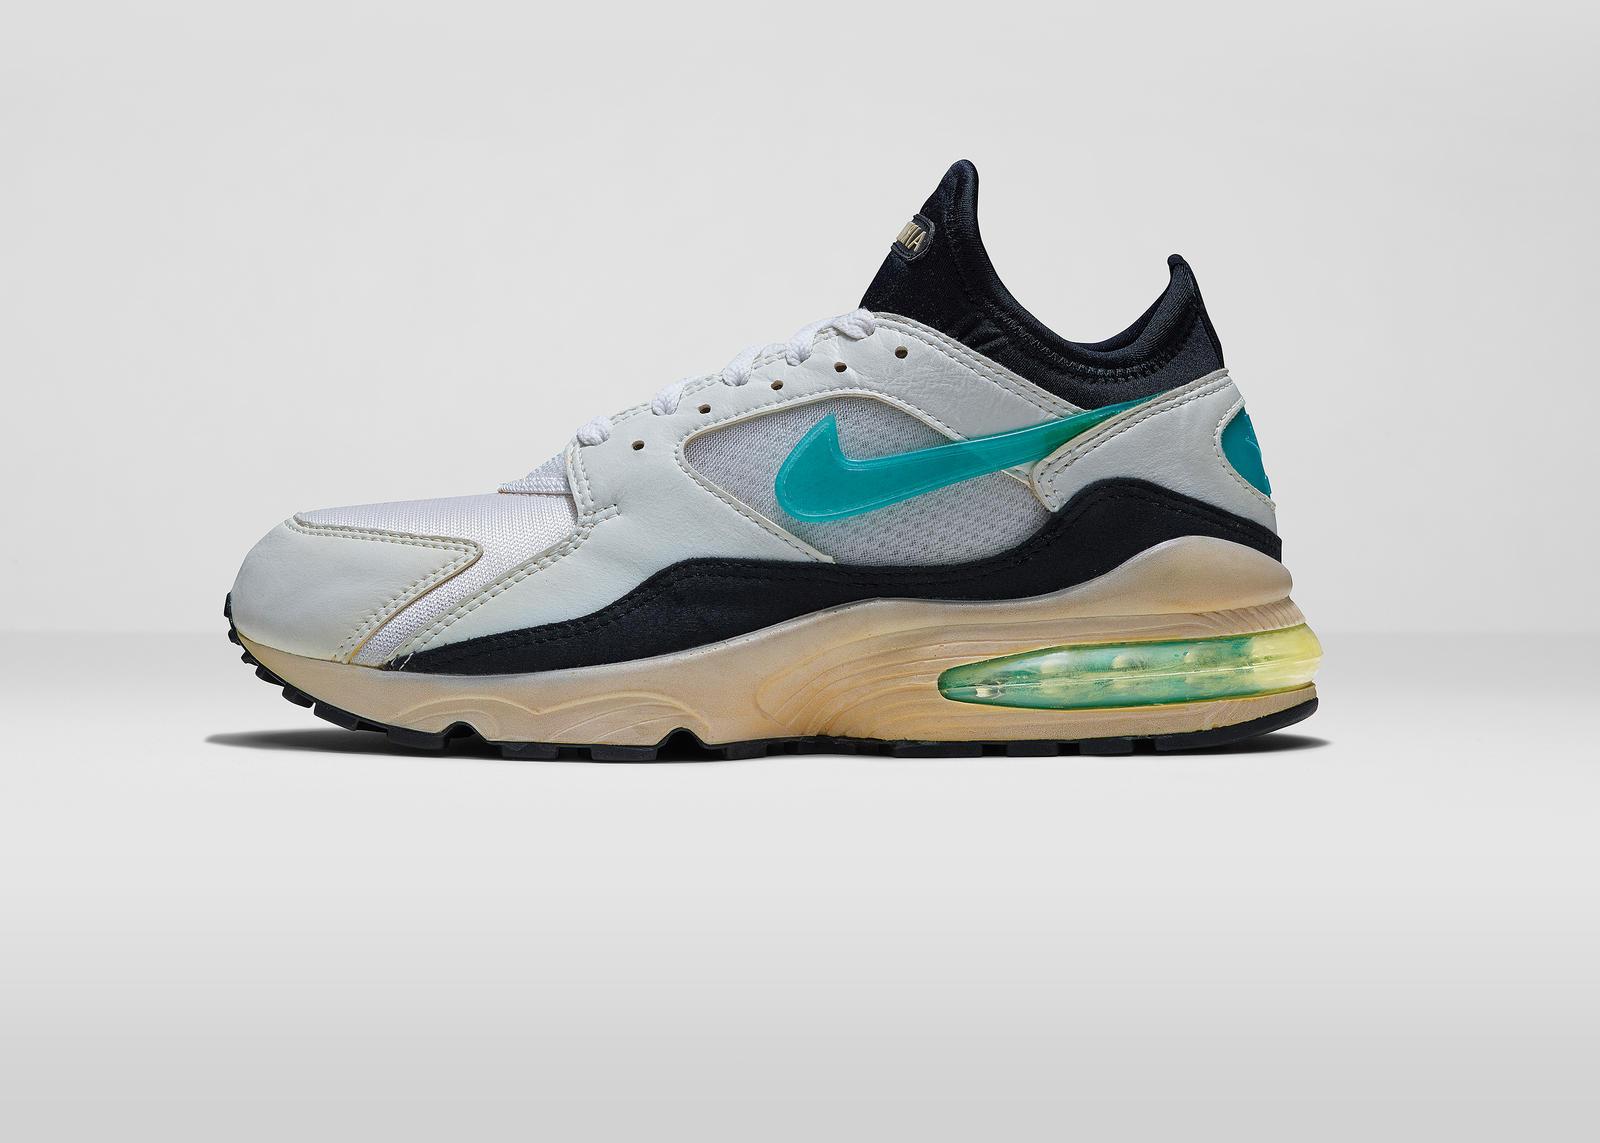 Nike_AirMaxDay_2015_1993_LAT